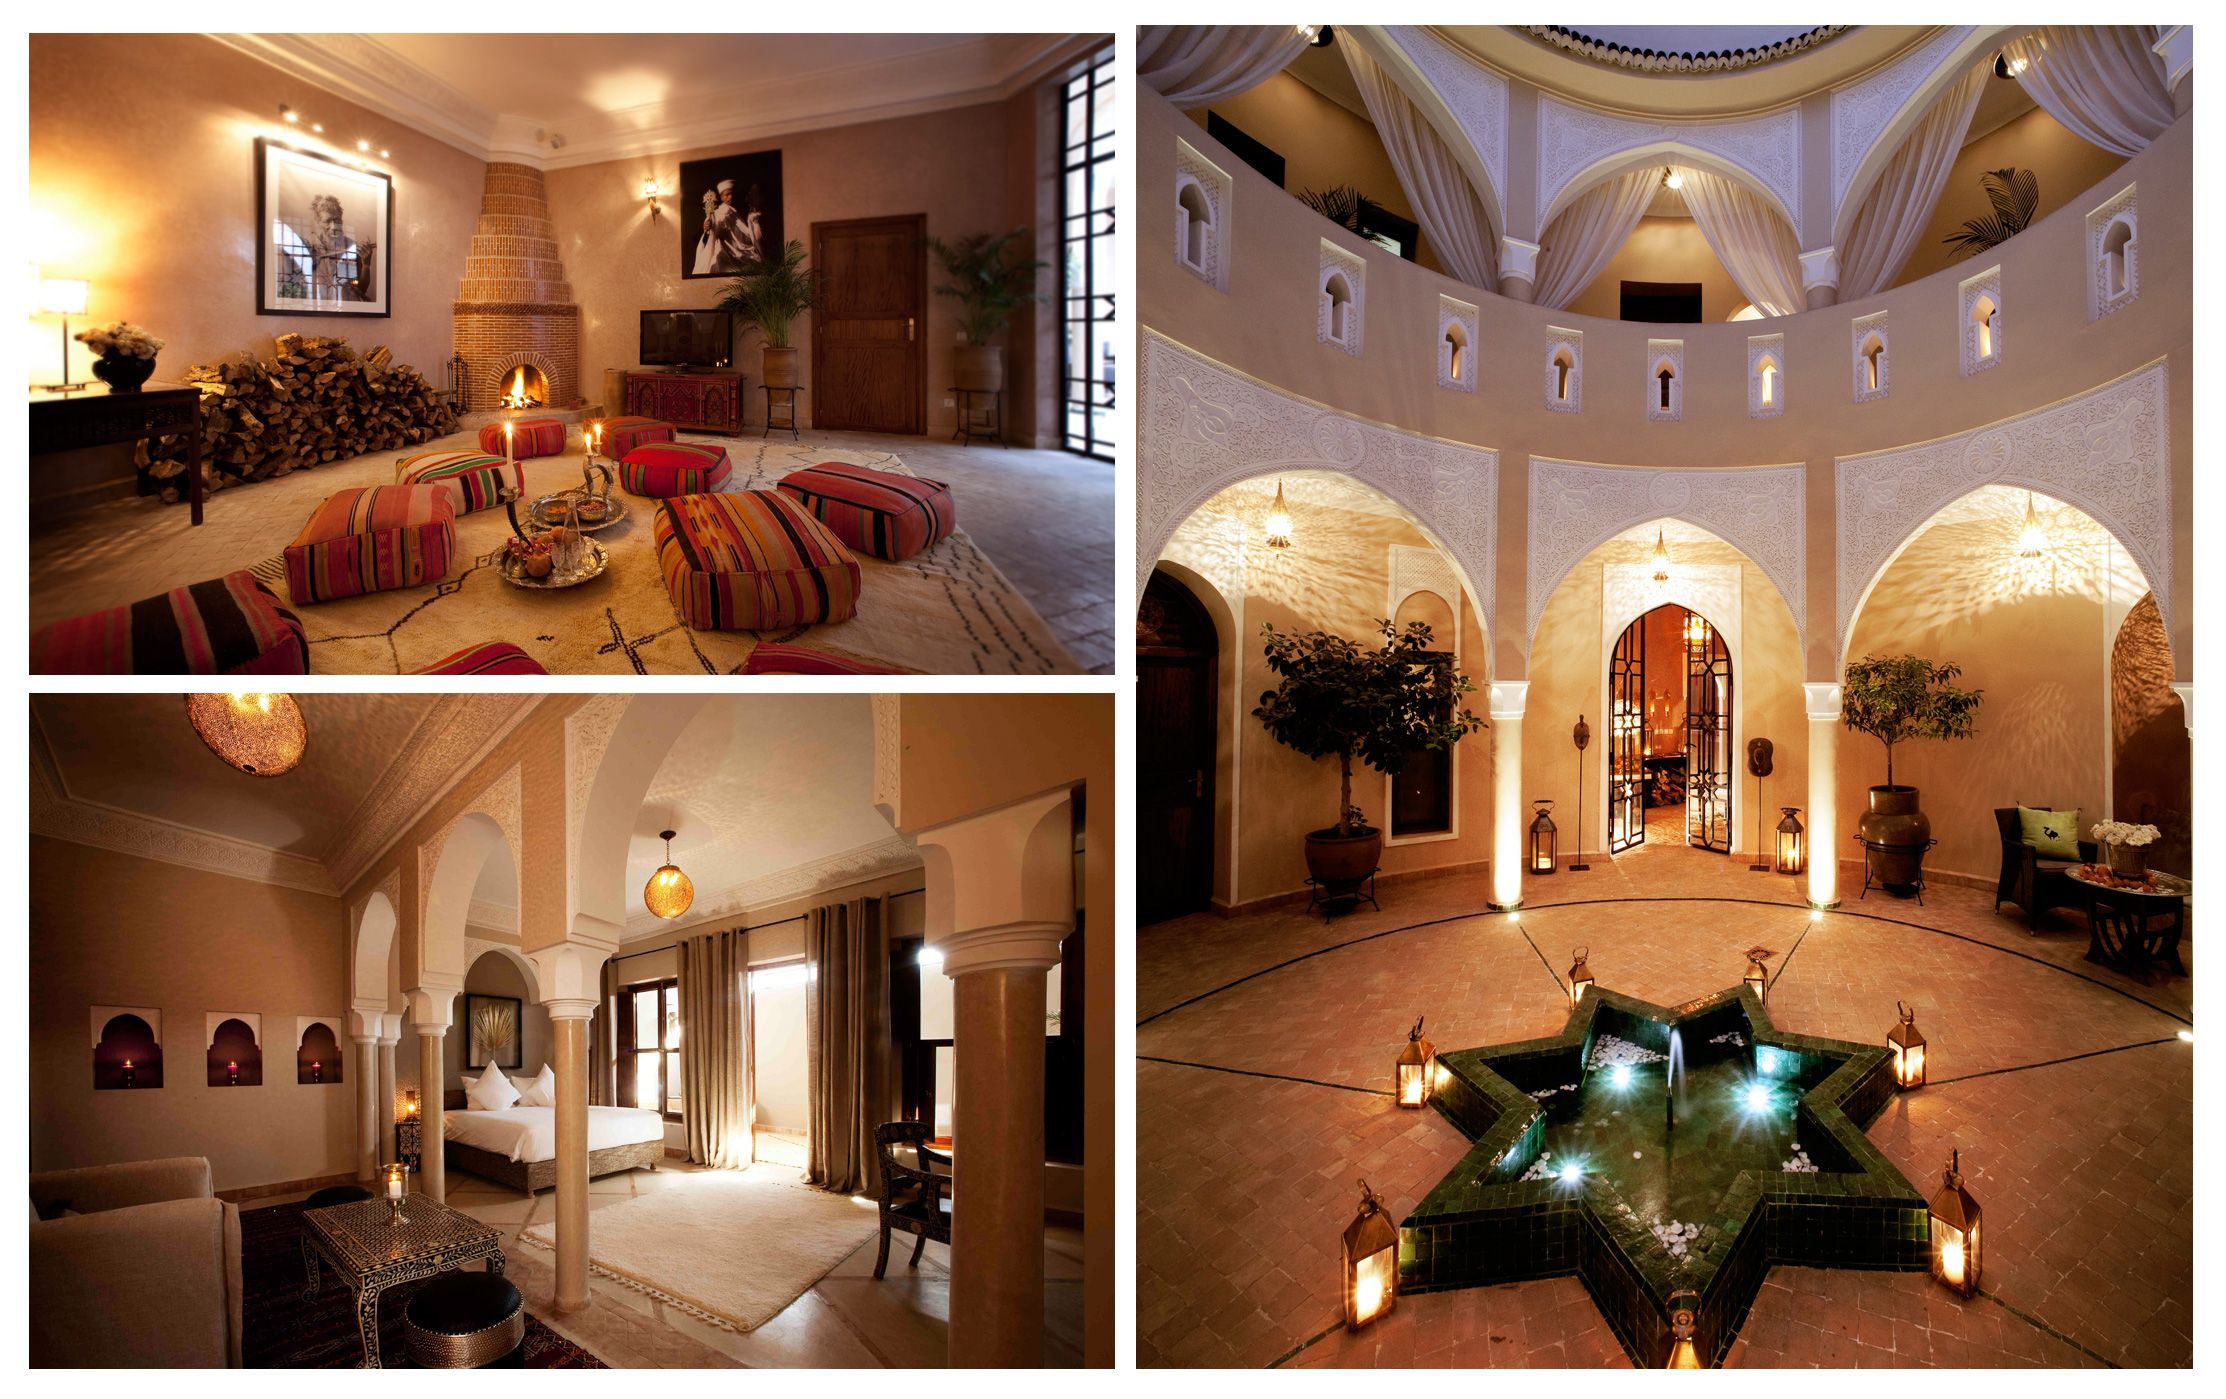 The Great Getaway Medina in Marrakesch